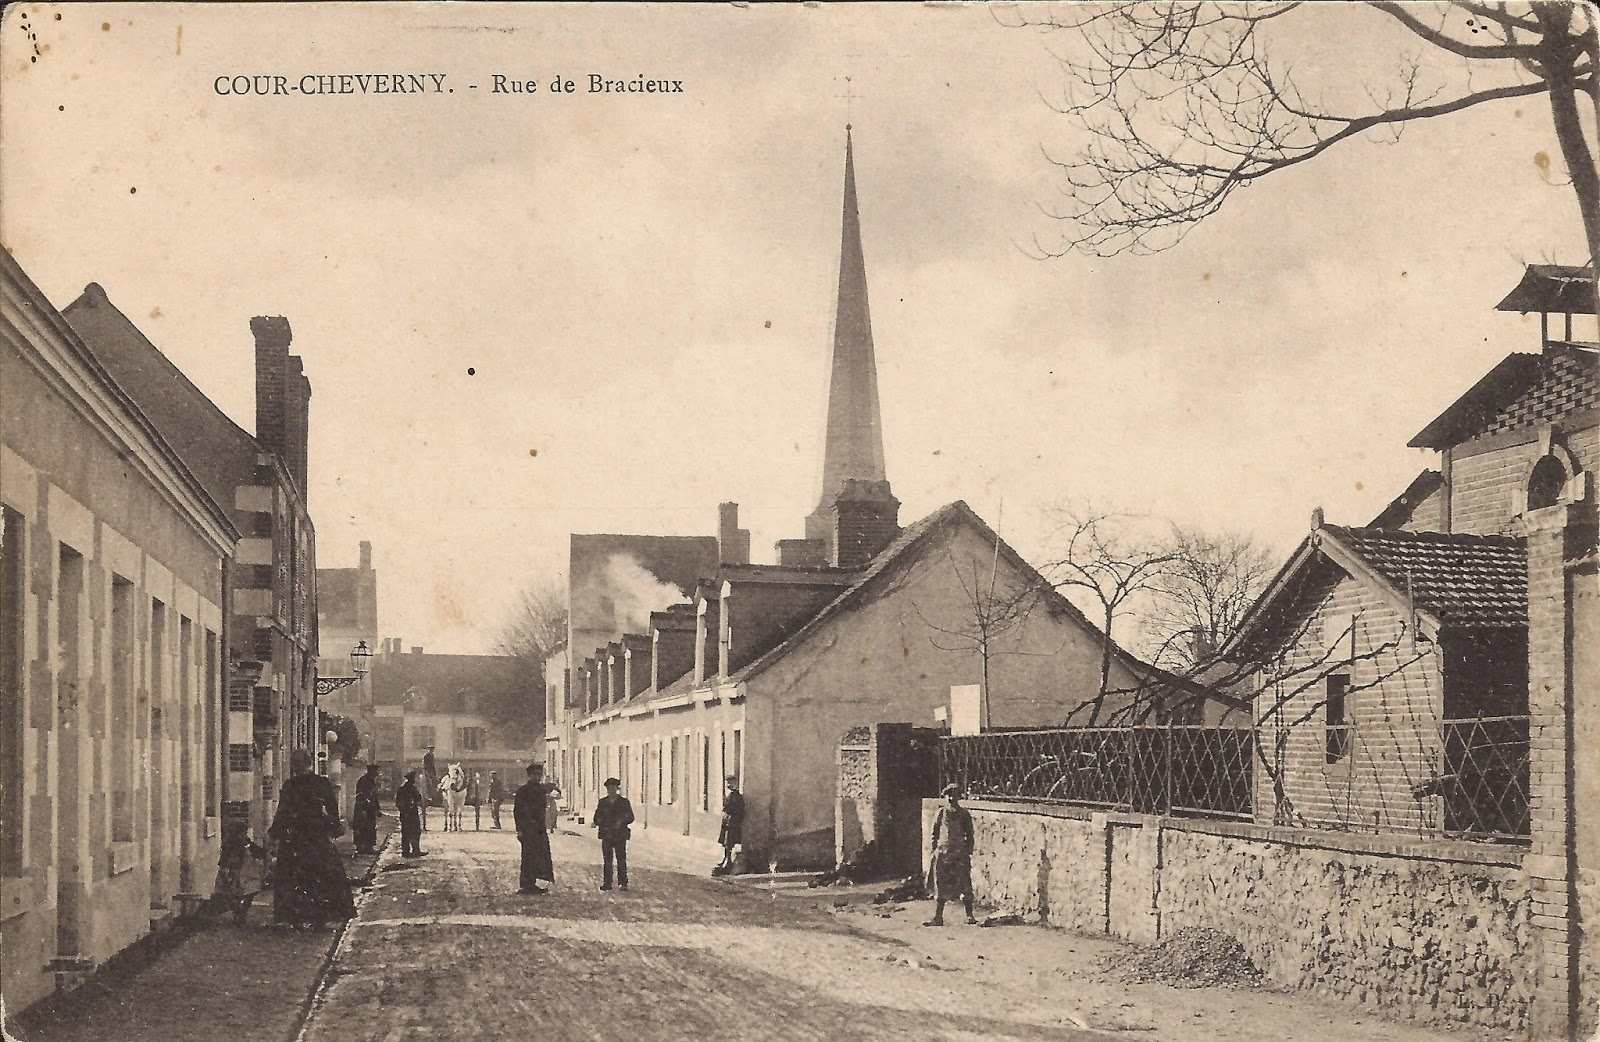 Rue Barberet à Cour-Cheverny - Ancienne usine à gaz